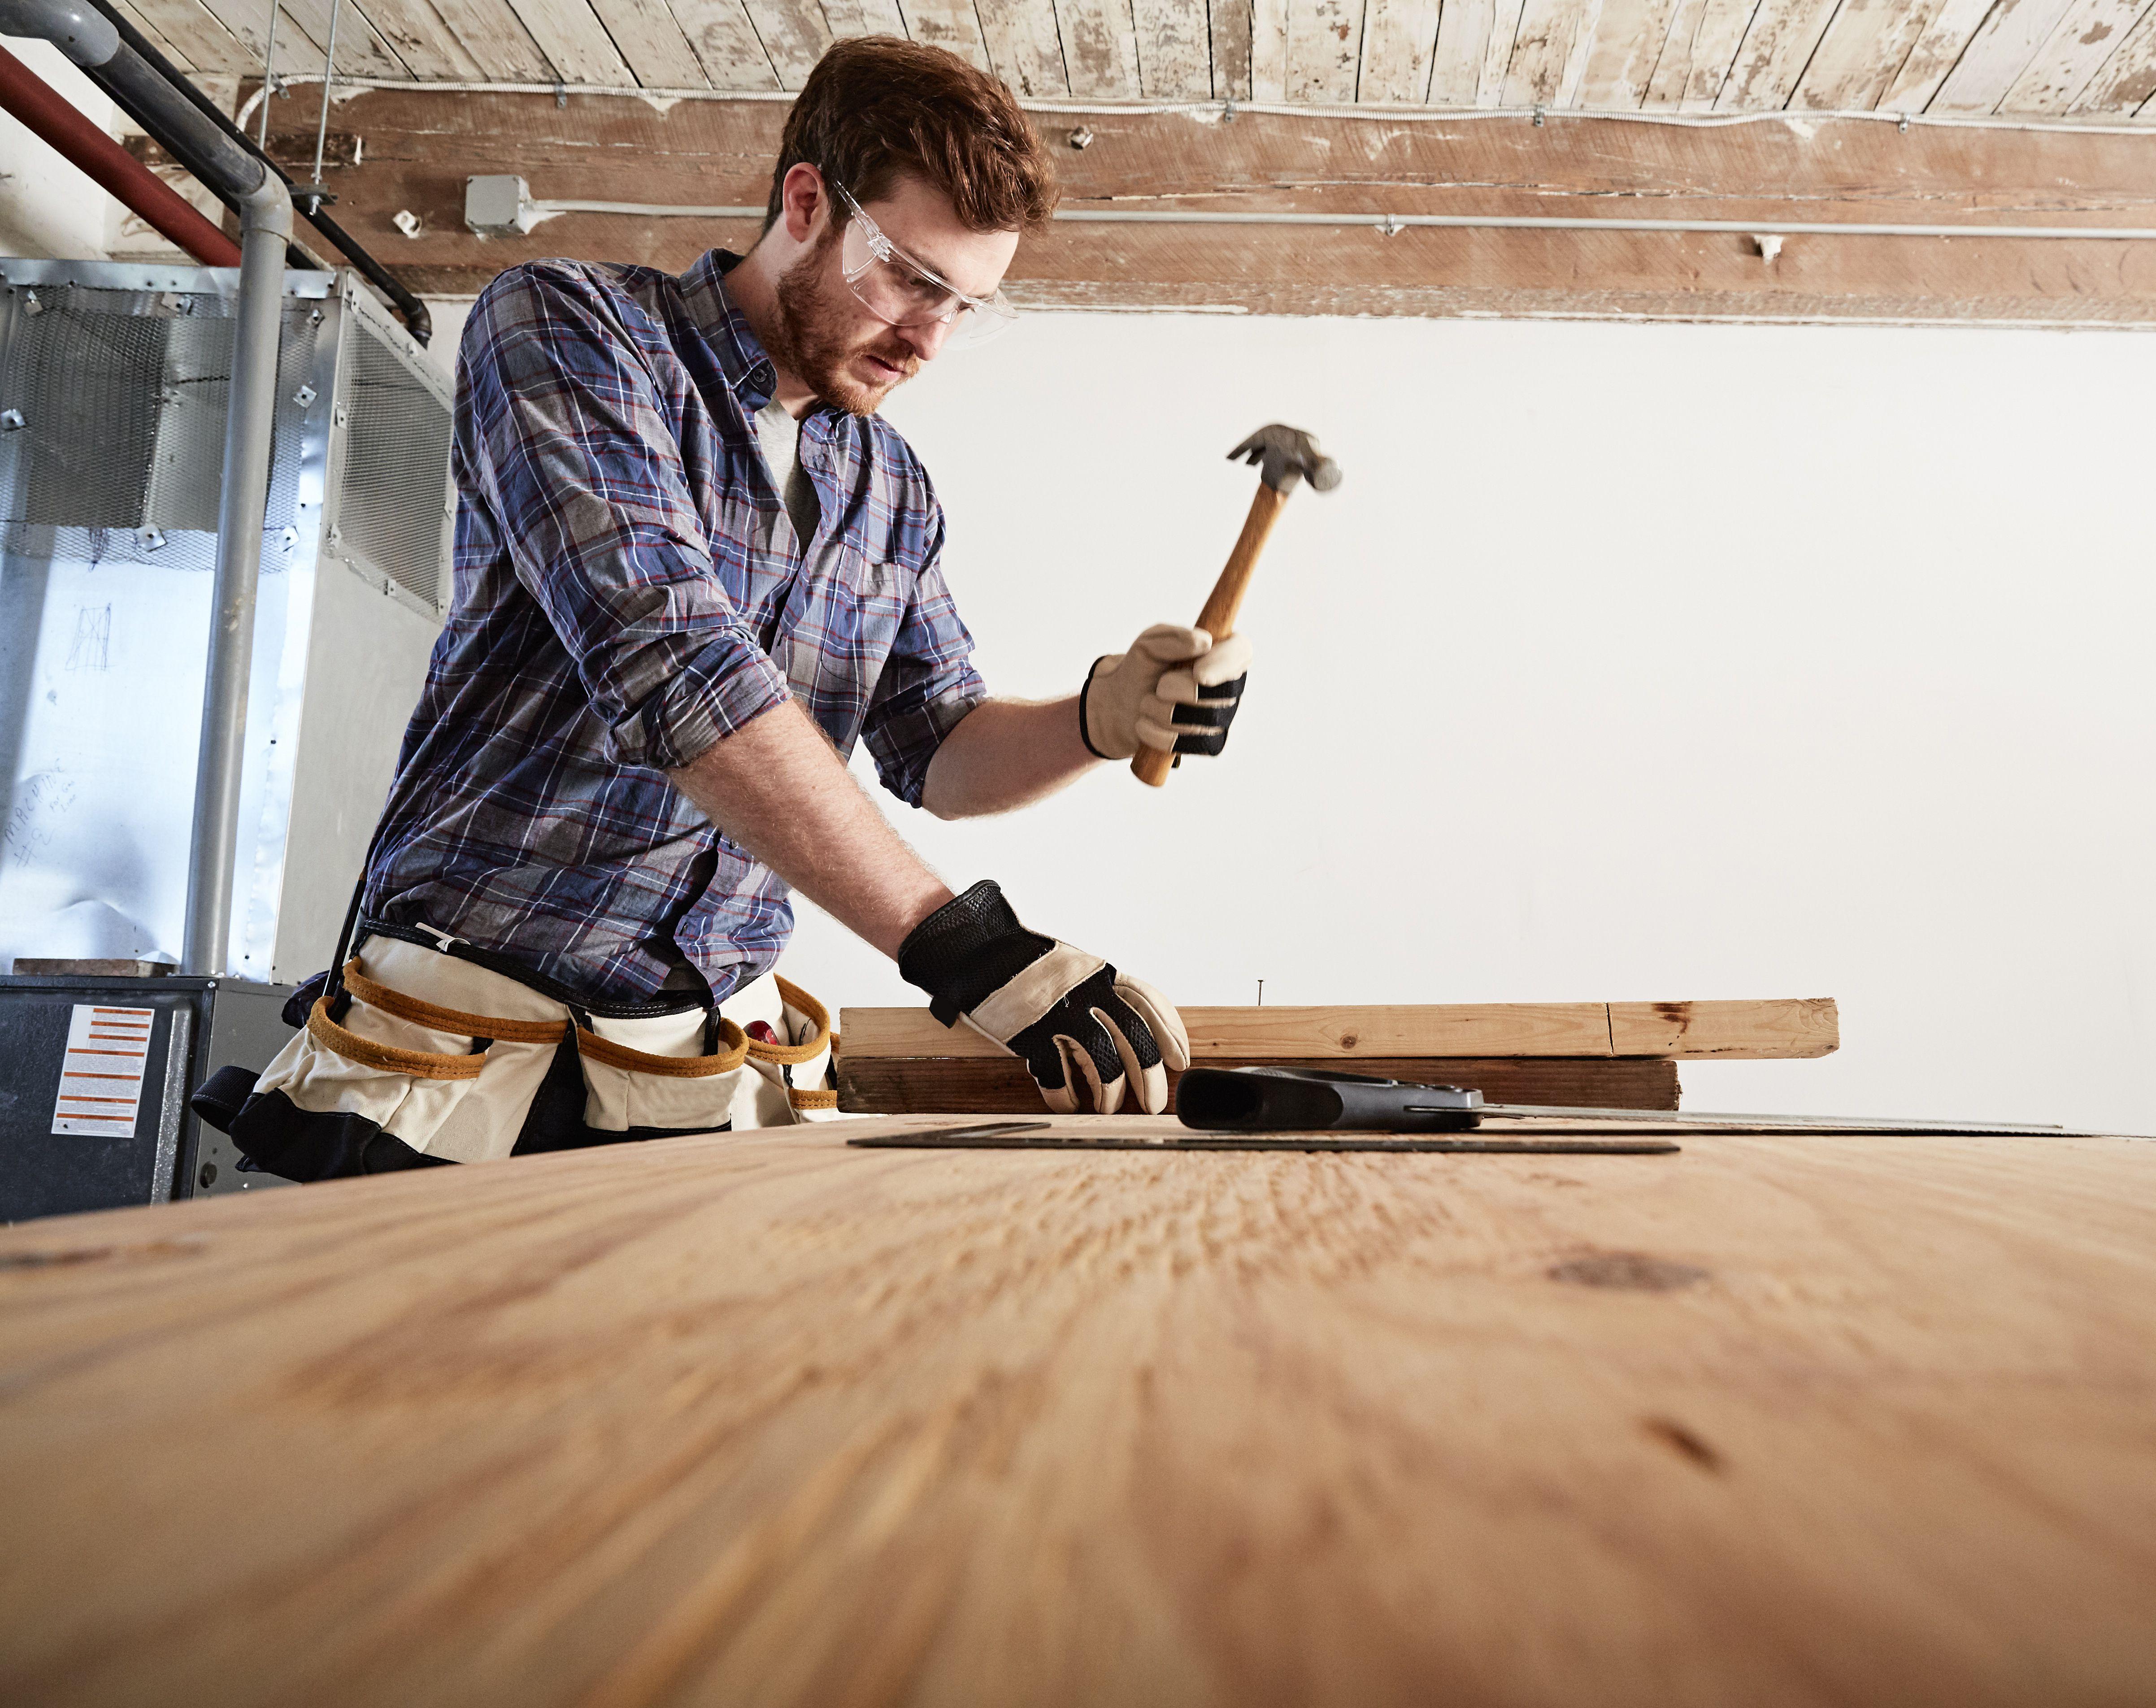 Carpenter in workshop using hammer